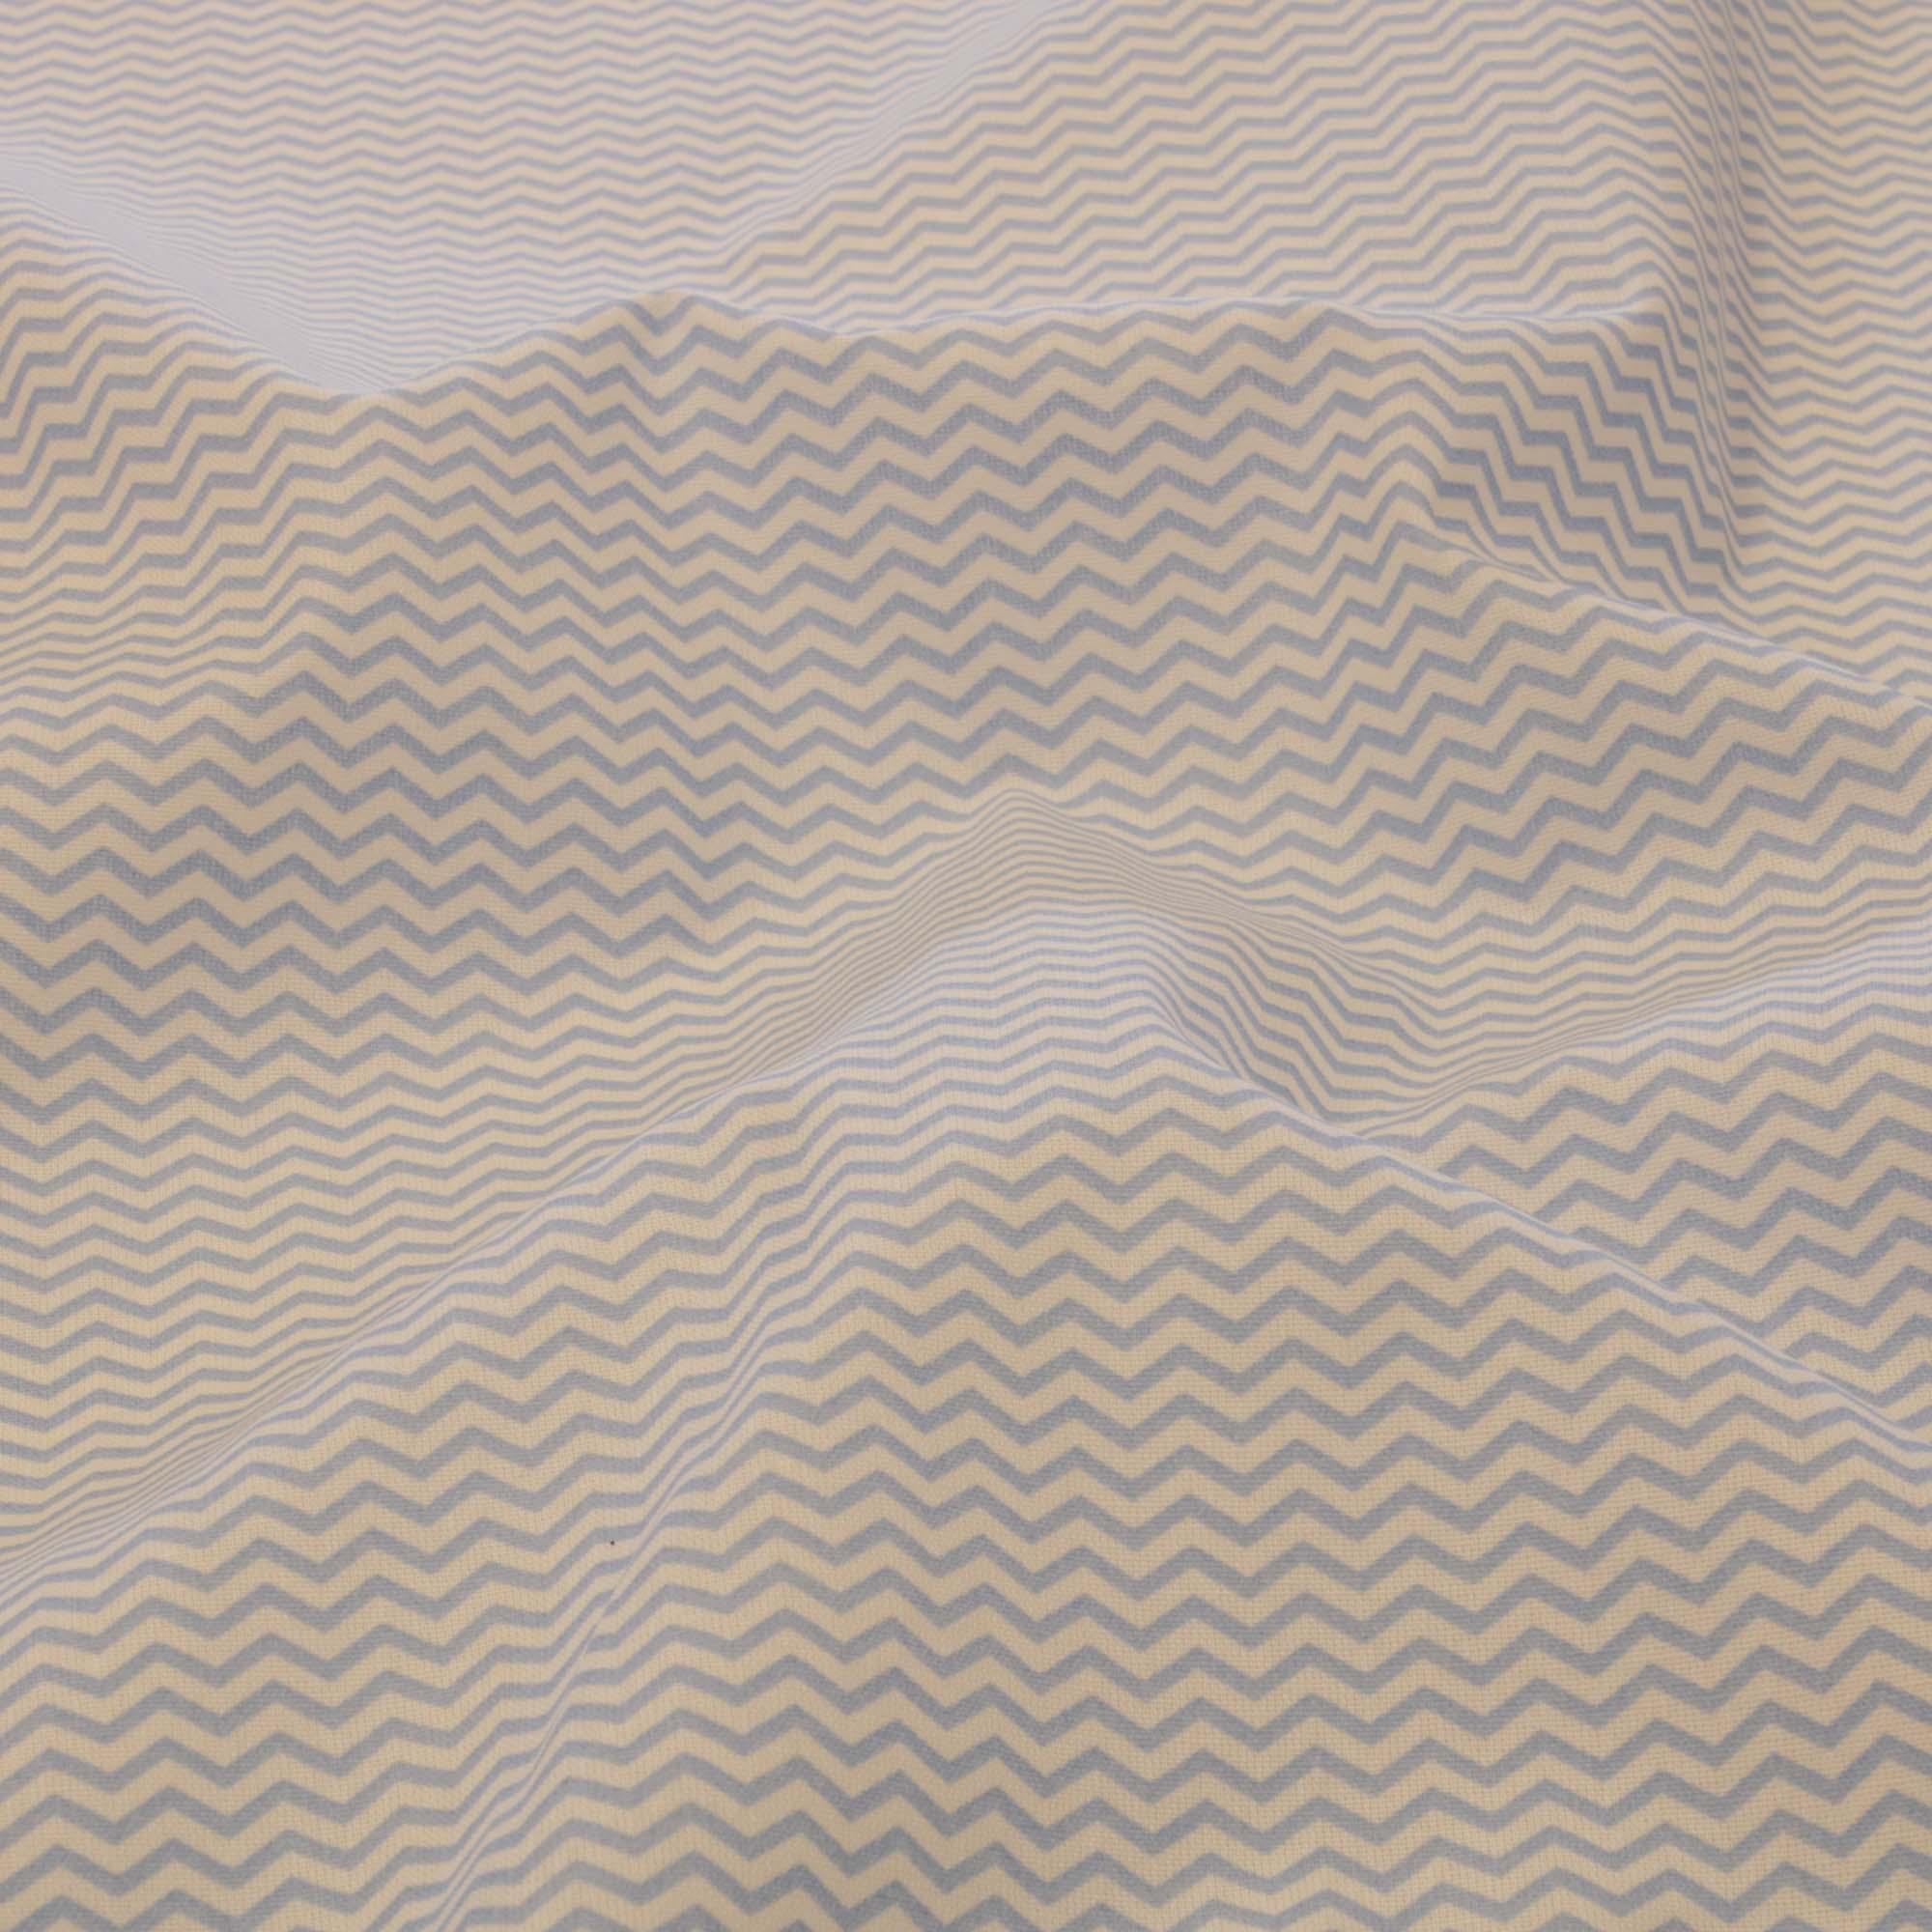 Tecido tricoline estampado chevron 1,40 m largura azul claro